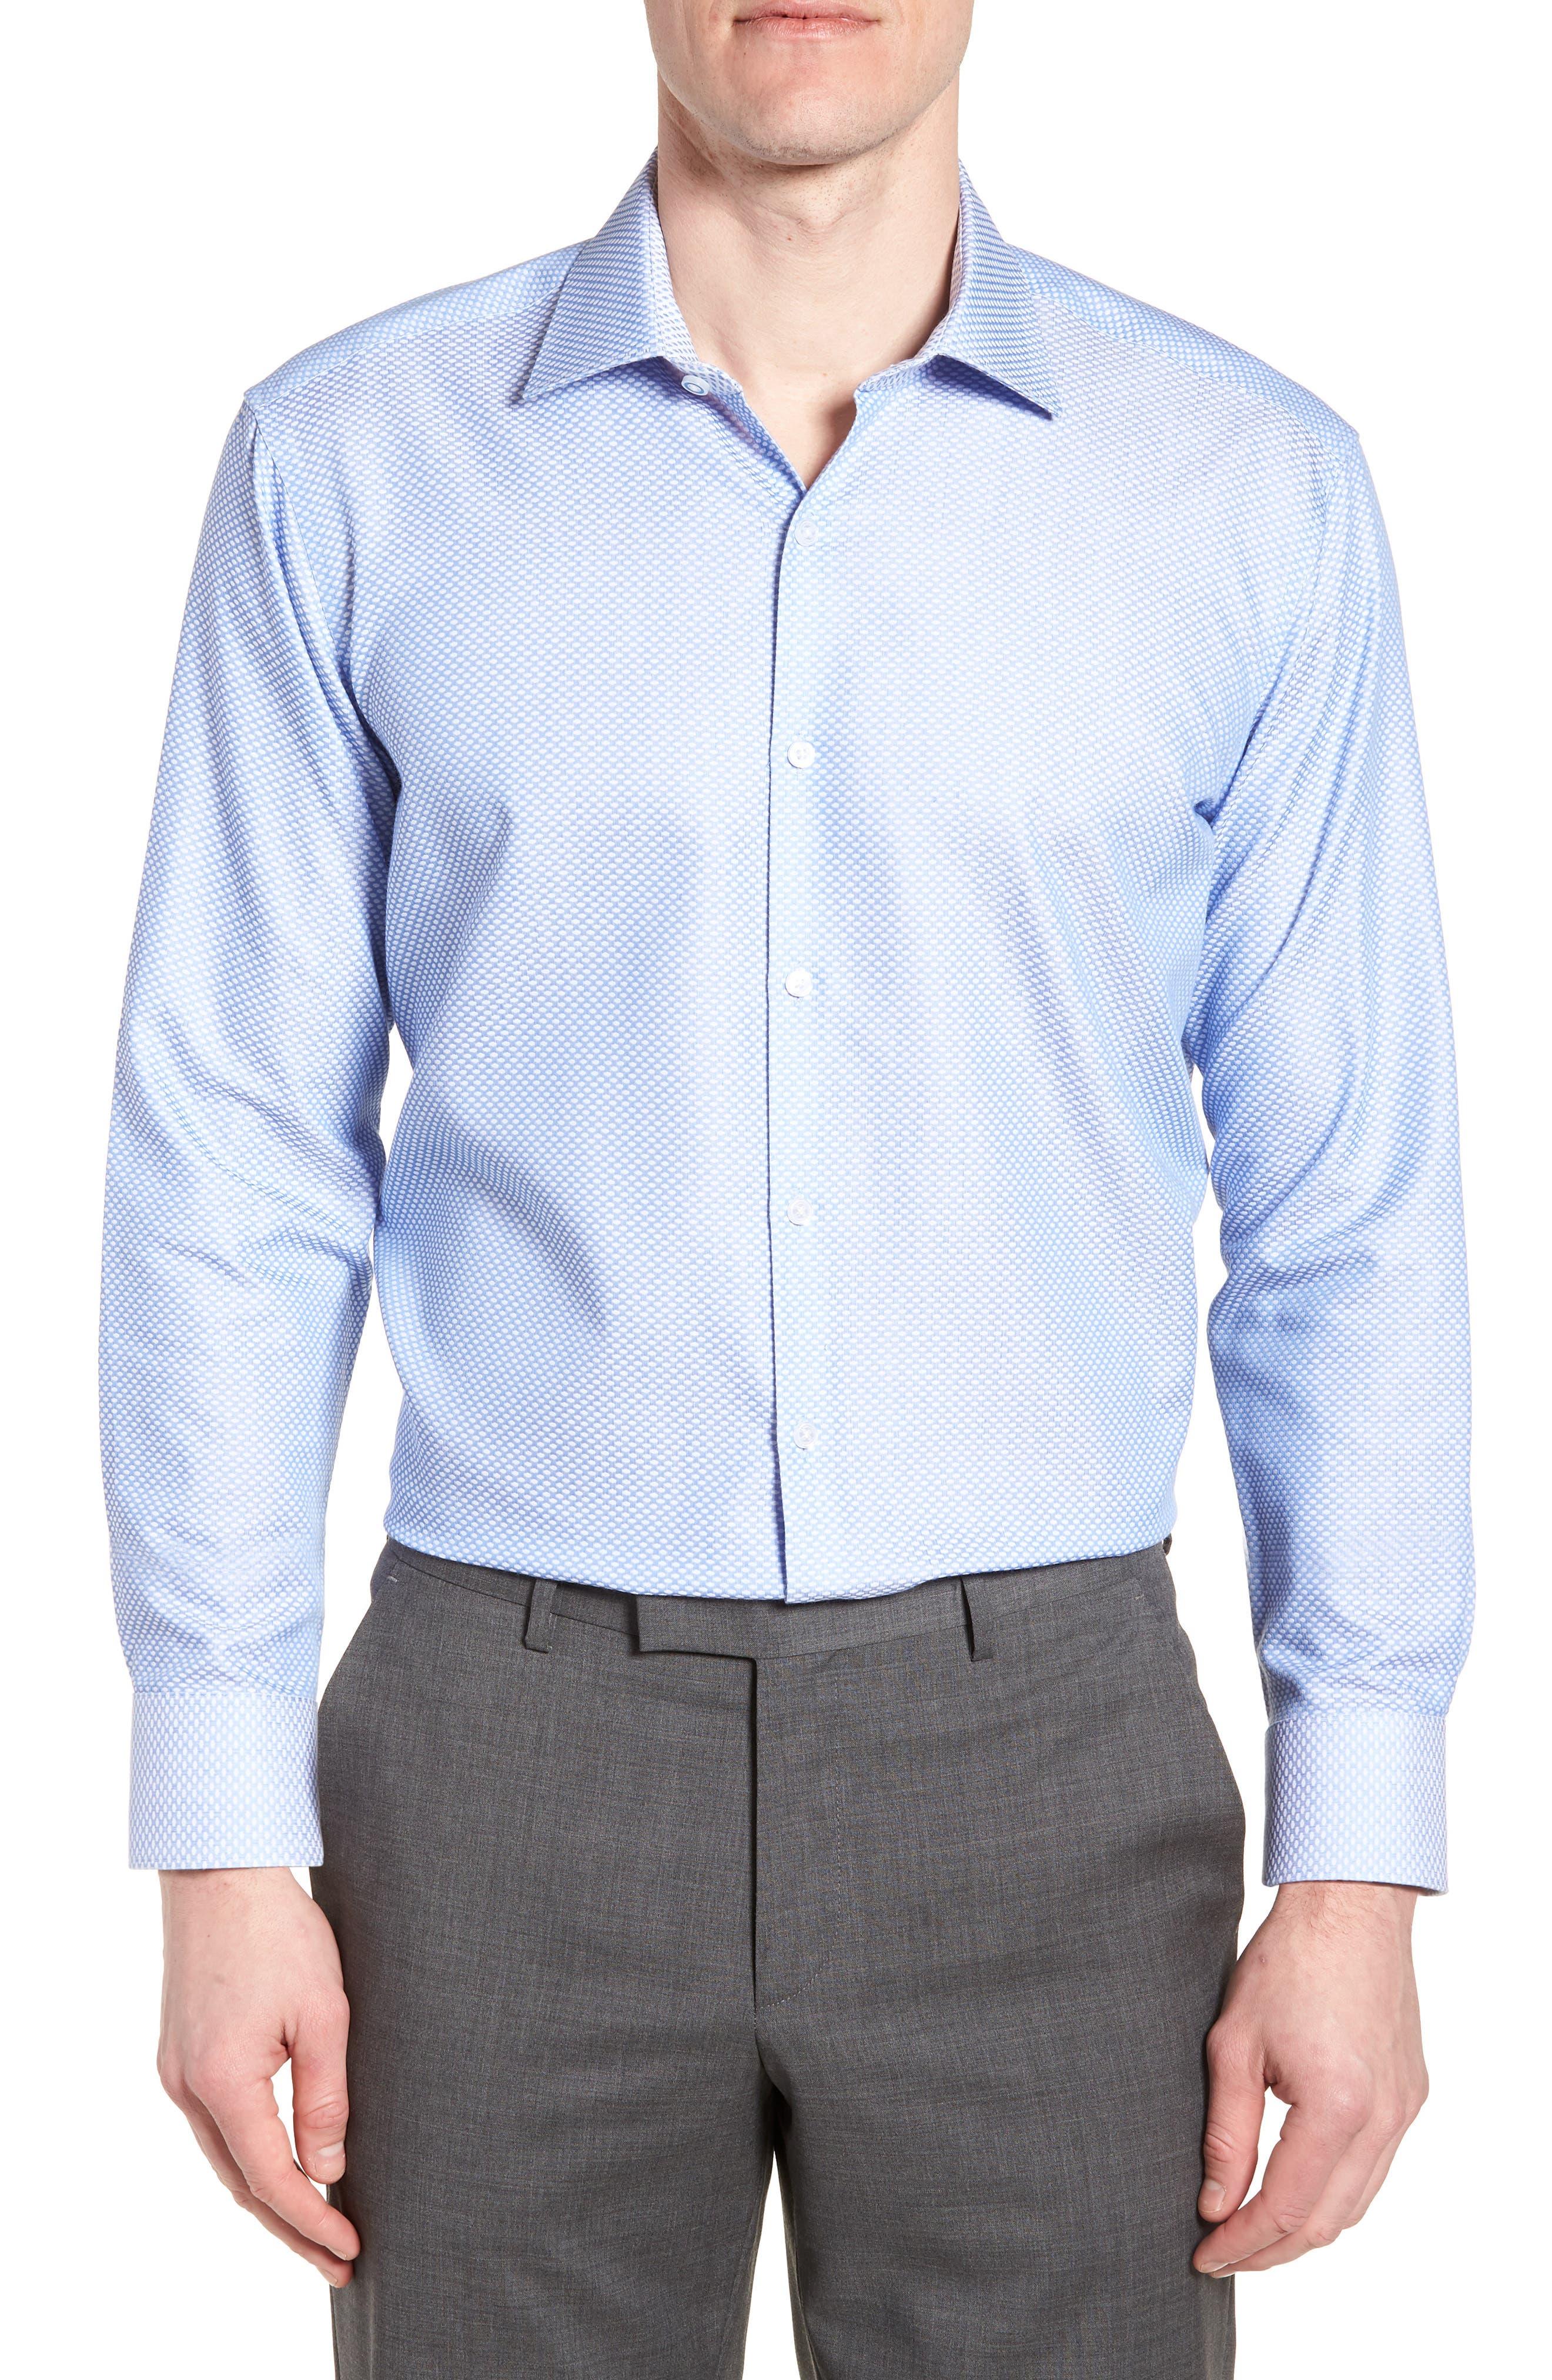 Holmes Trim Fit Dot Dress Shirt,                             Main thumbnail 1, color,                             450